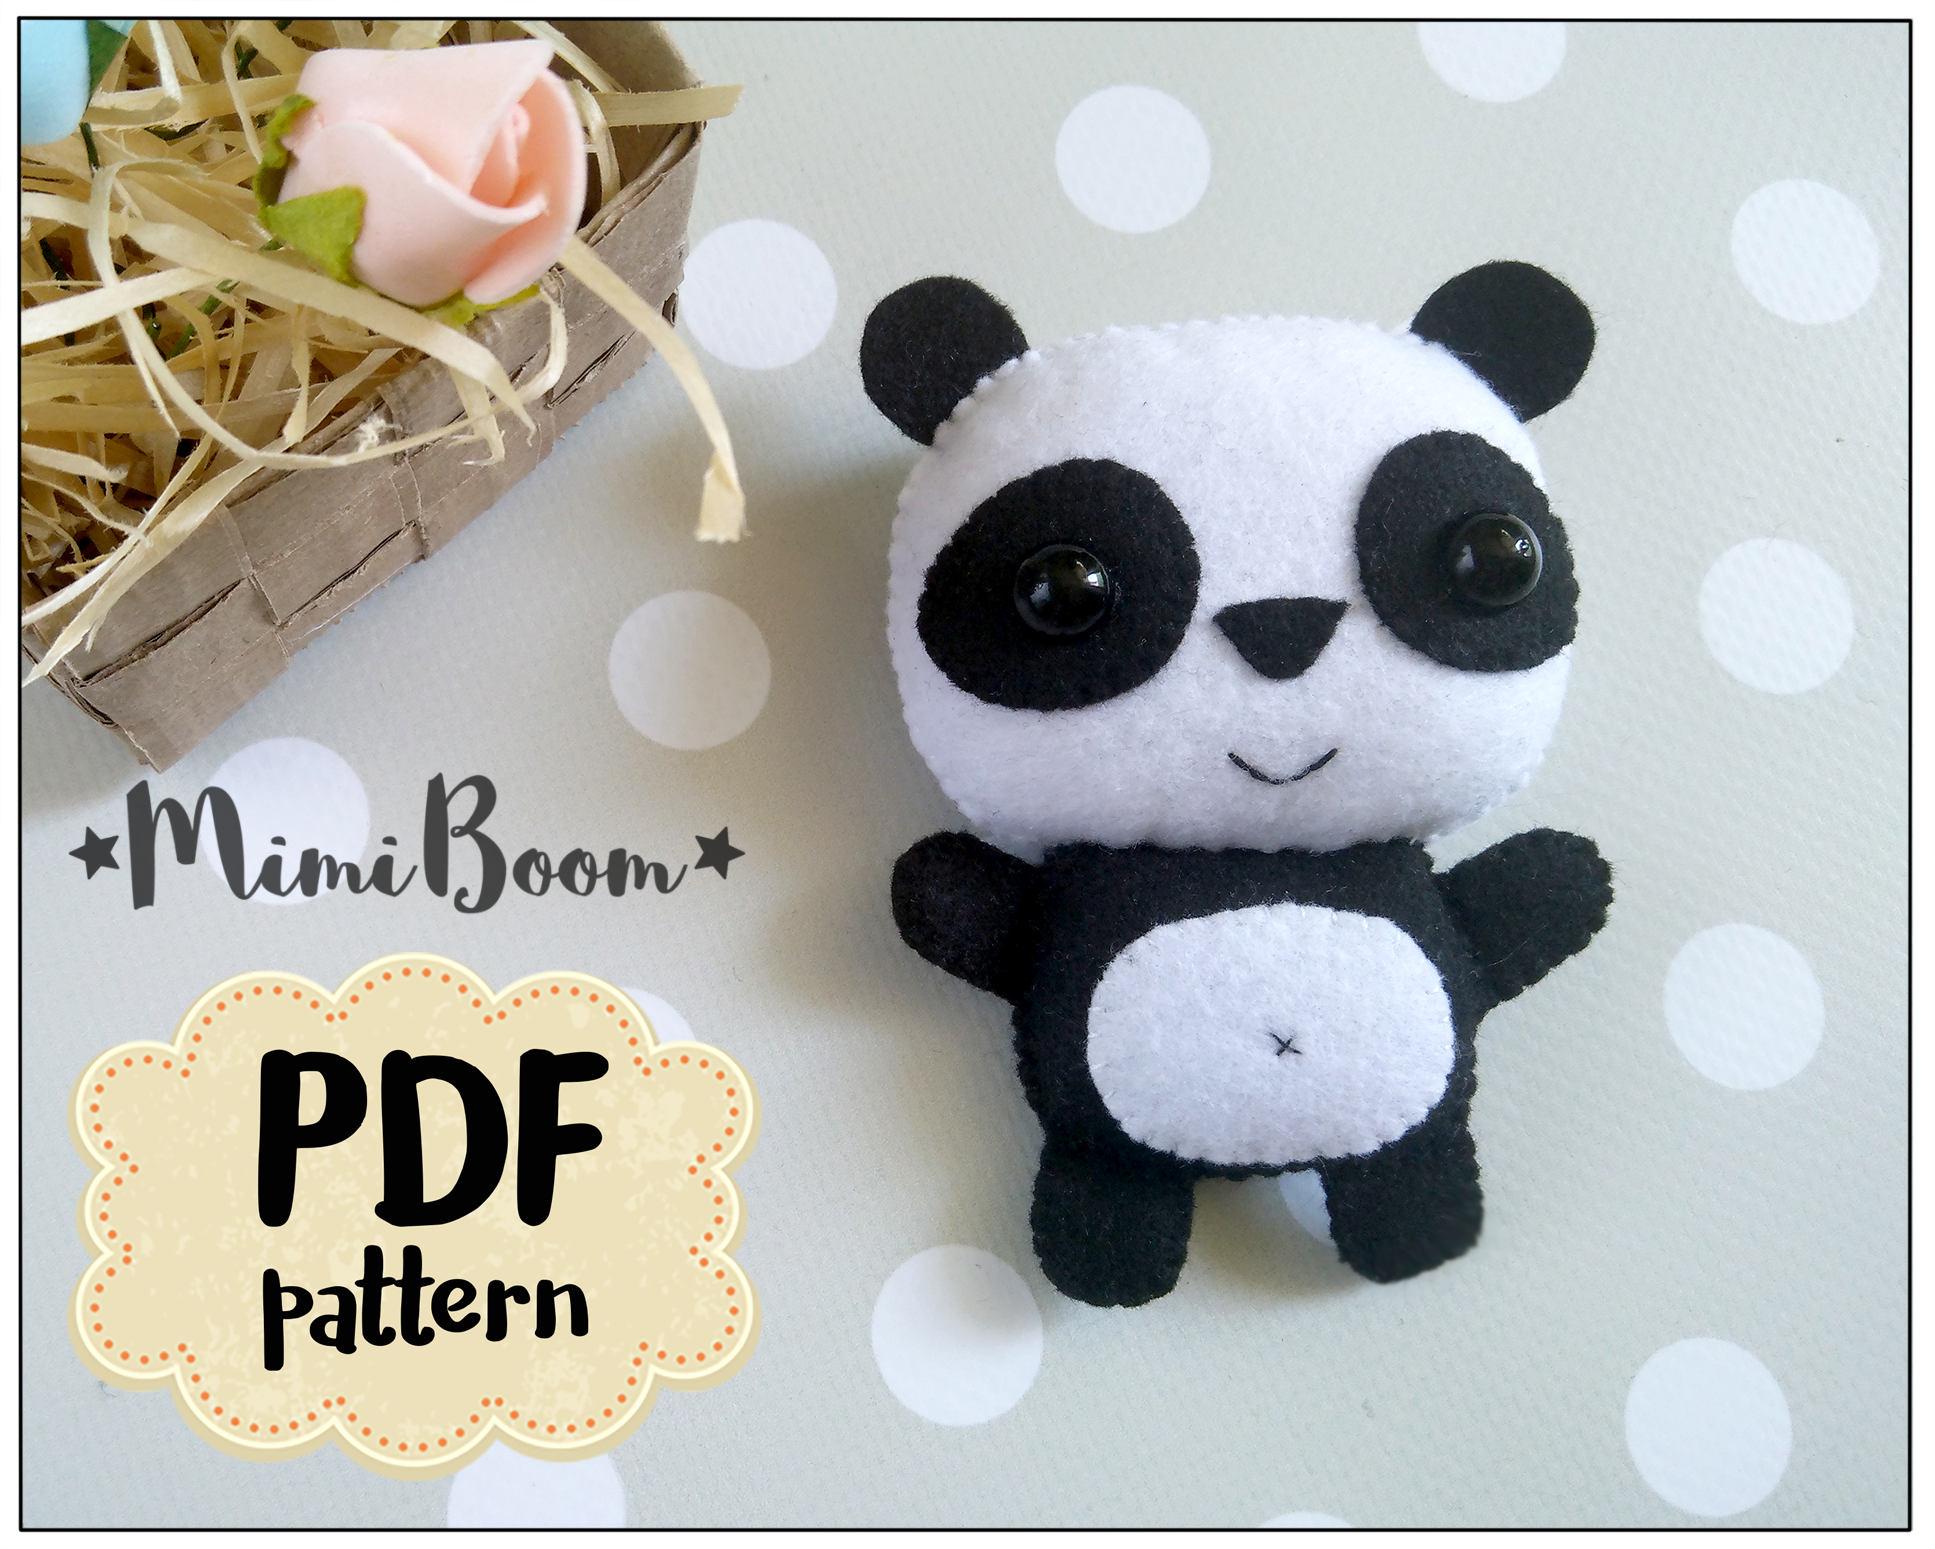 Buy Plush Panda pattern pictures trends